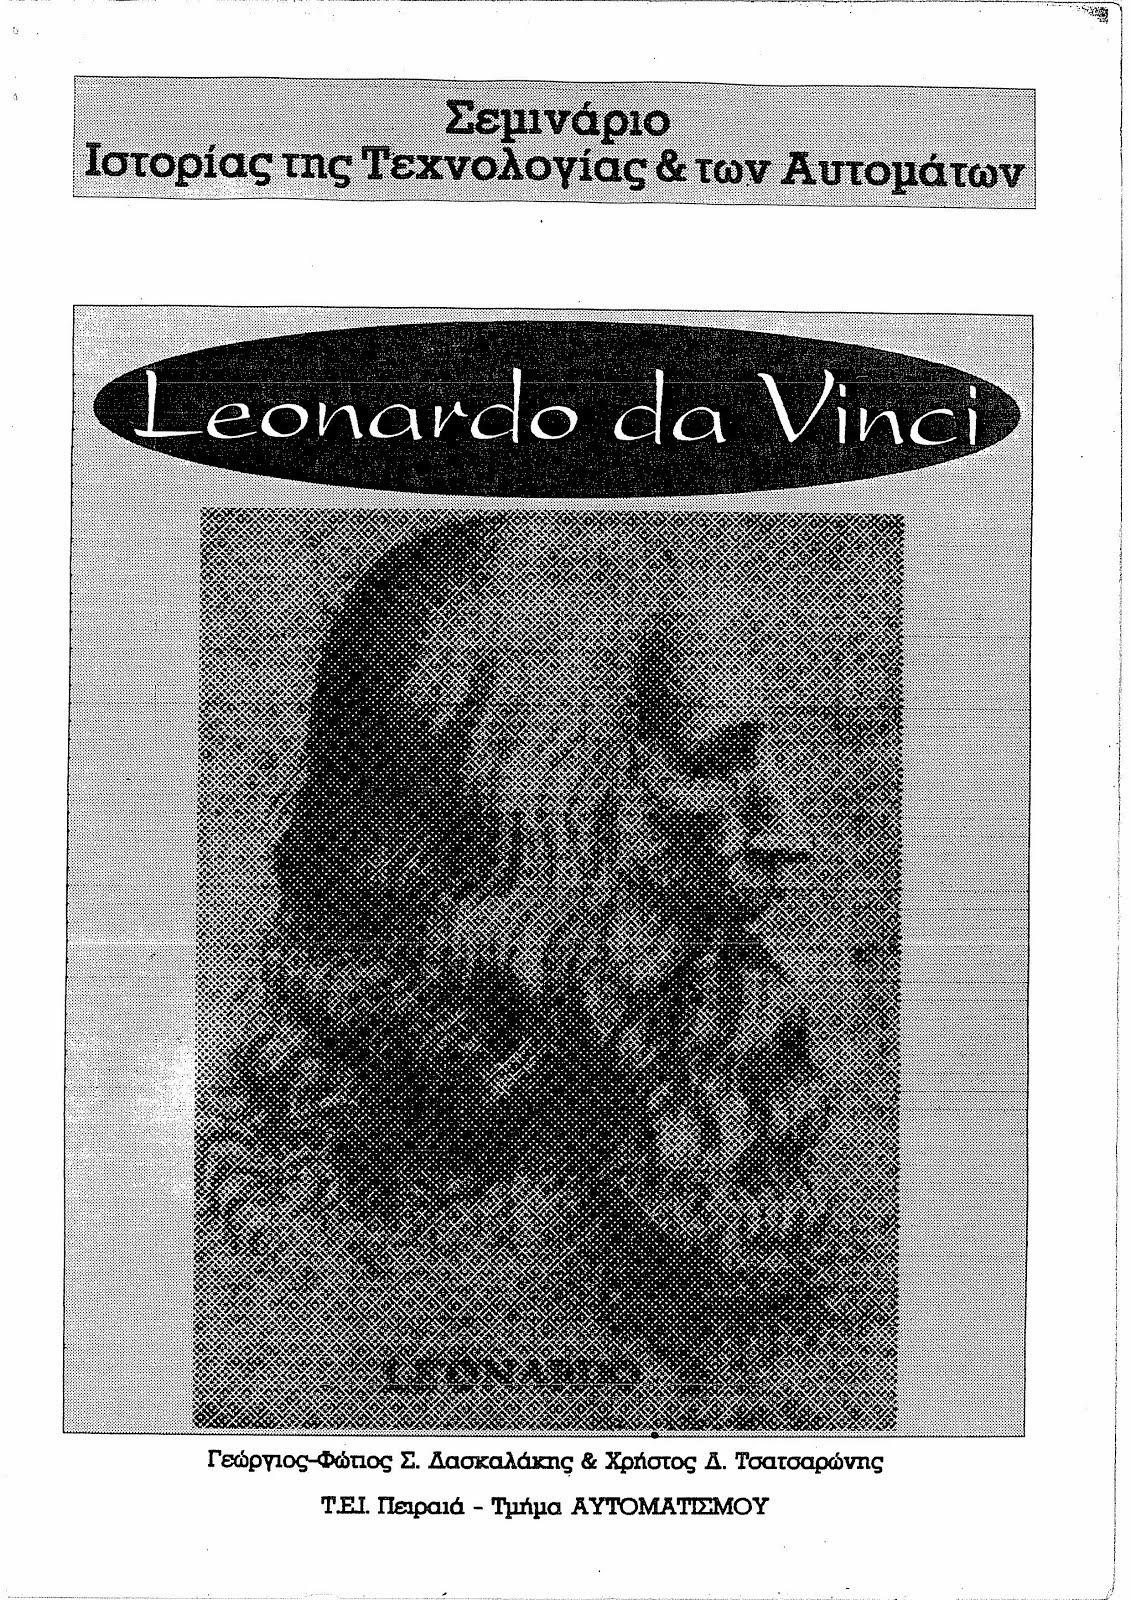 Leonardo Da Vinci - Γεώργιος Φώτιος Σ. Δασκαλάκης, Χρήστος Δ. Τσατσαρώνης